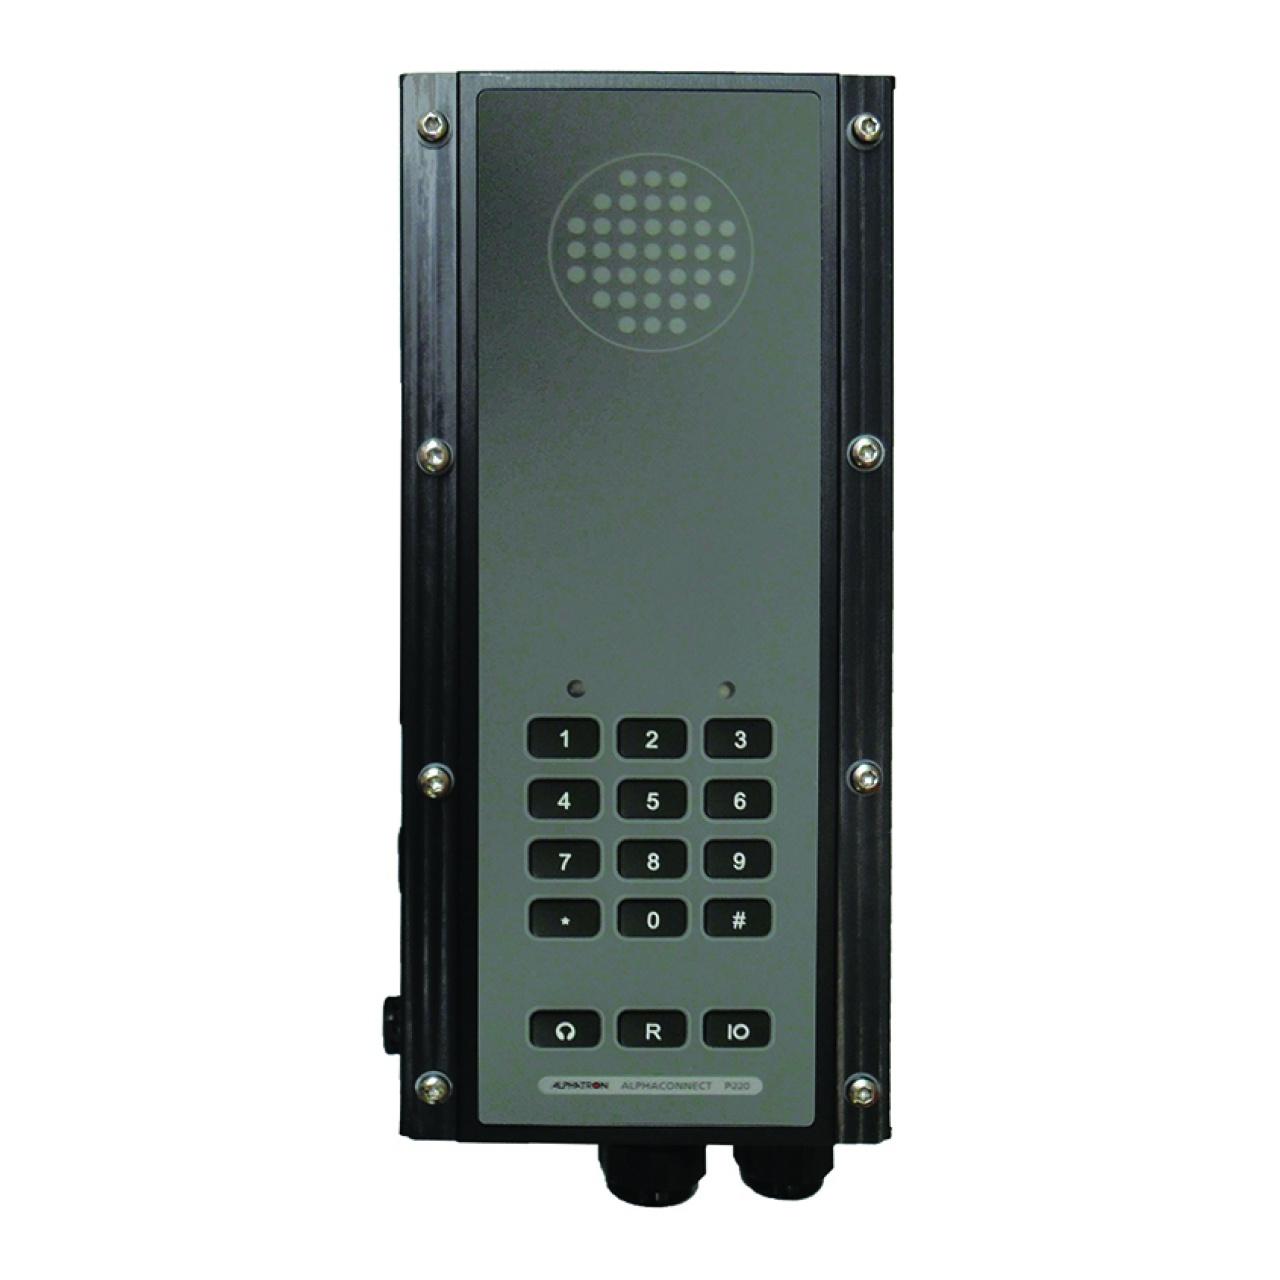 AlphaPhone P220 Image